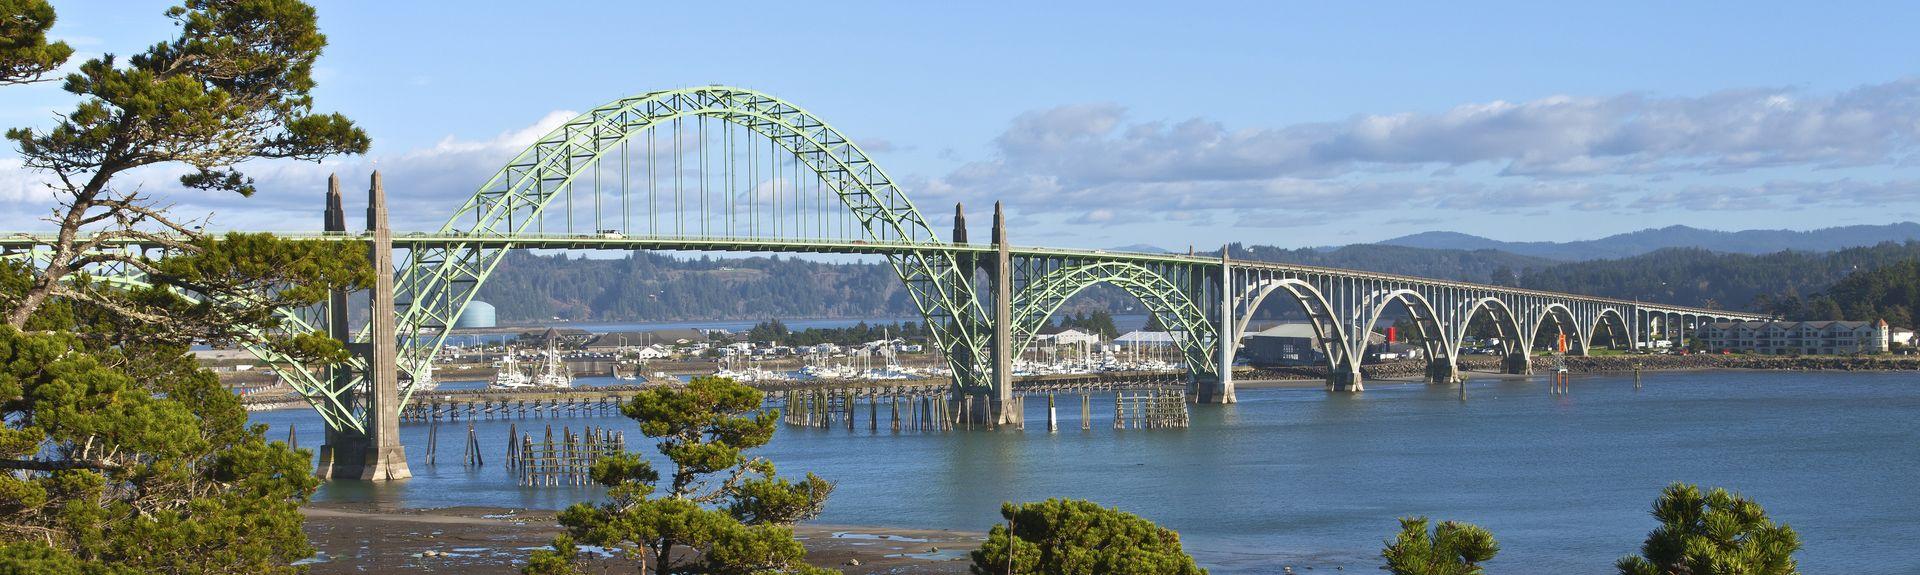 Newport, Oregon, Stati Uniti d'America